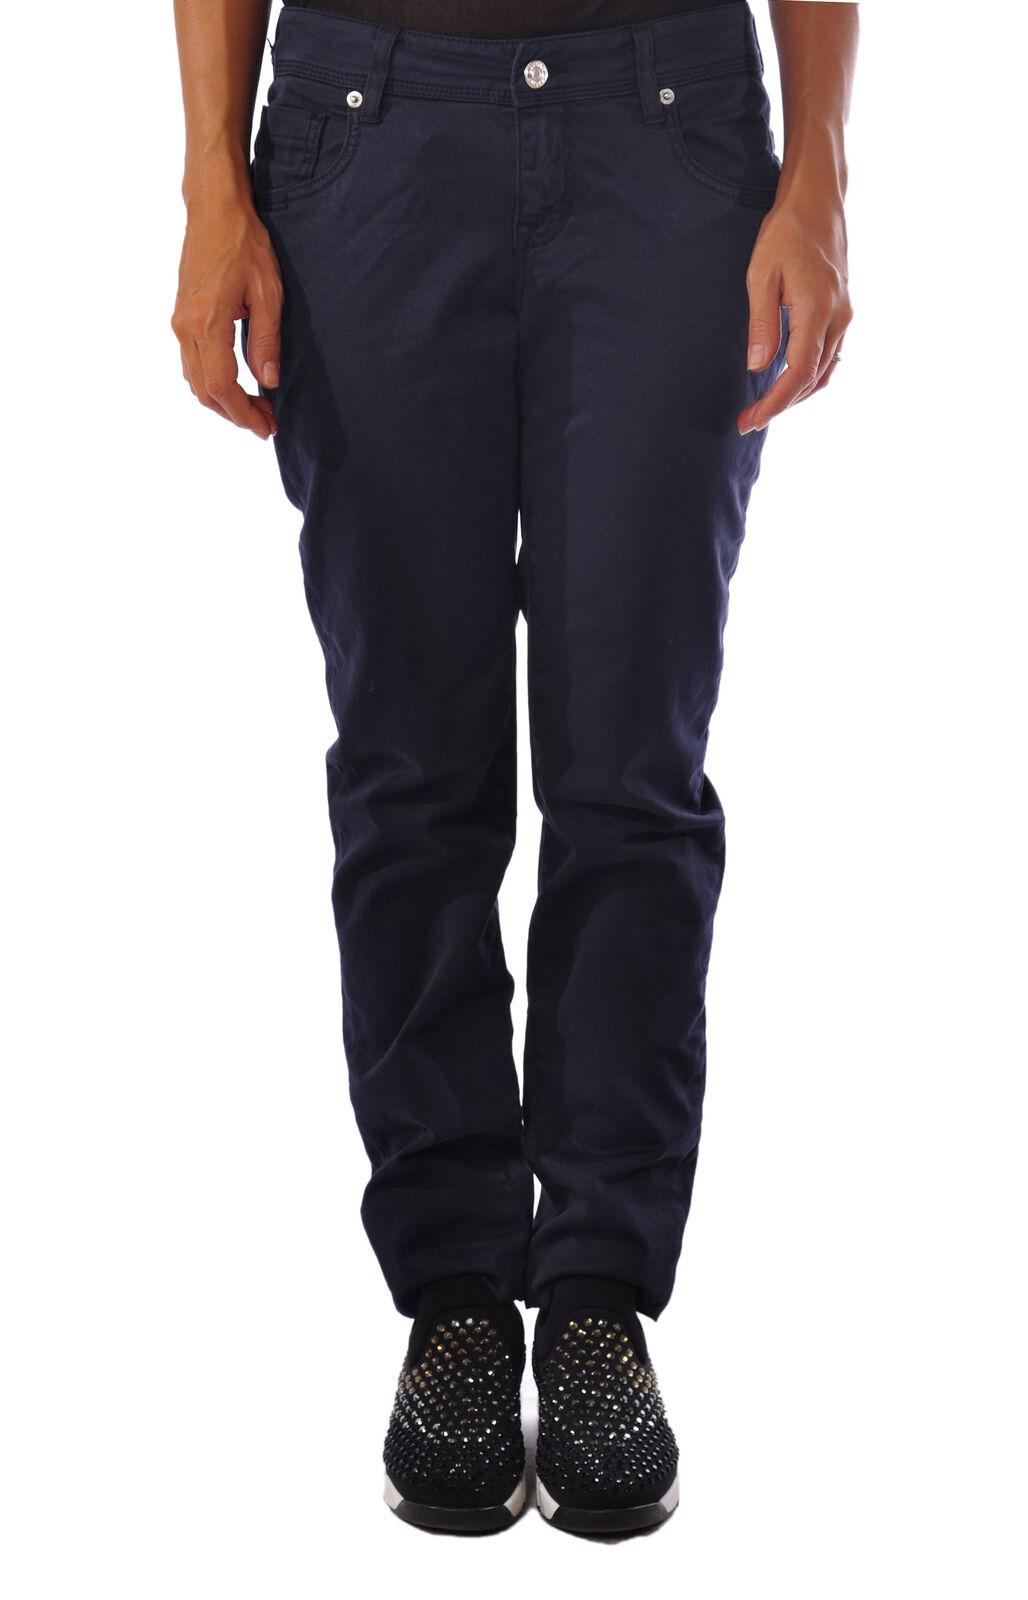 Latinò - Jeans-Pants - femme - bleu - 945917C184440